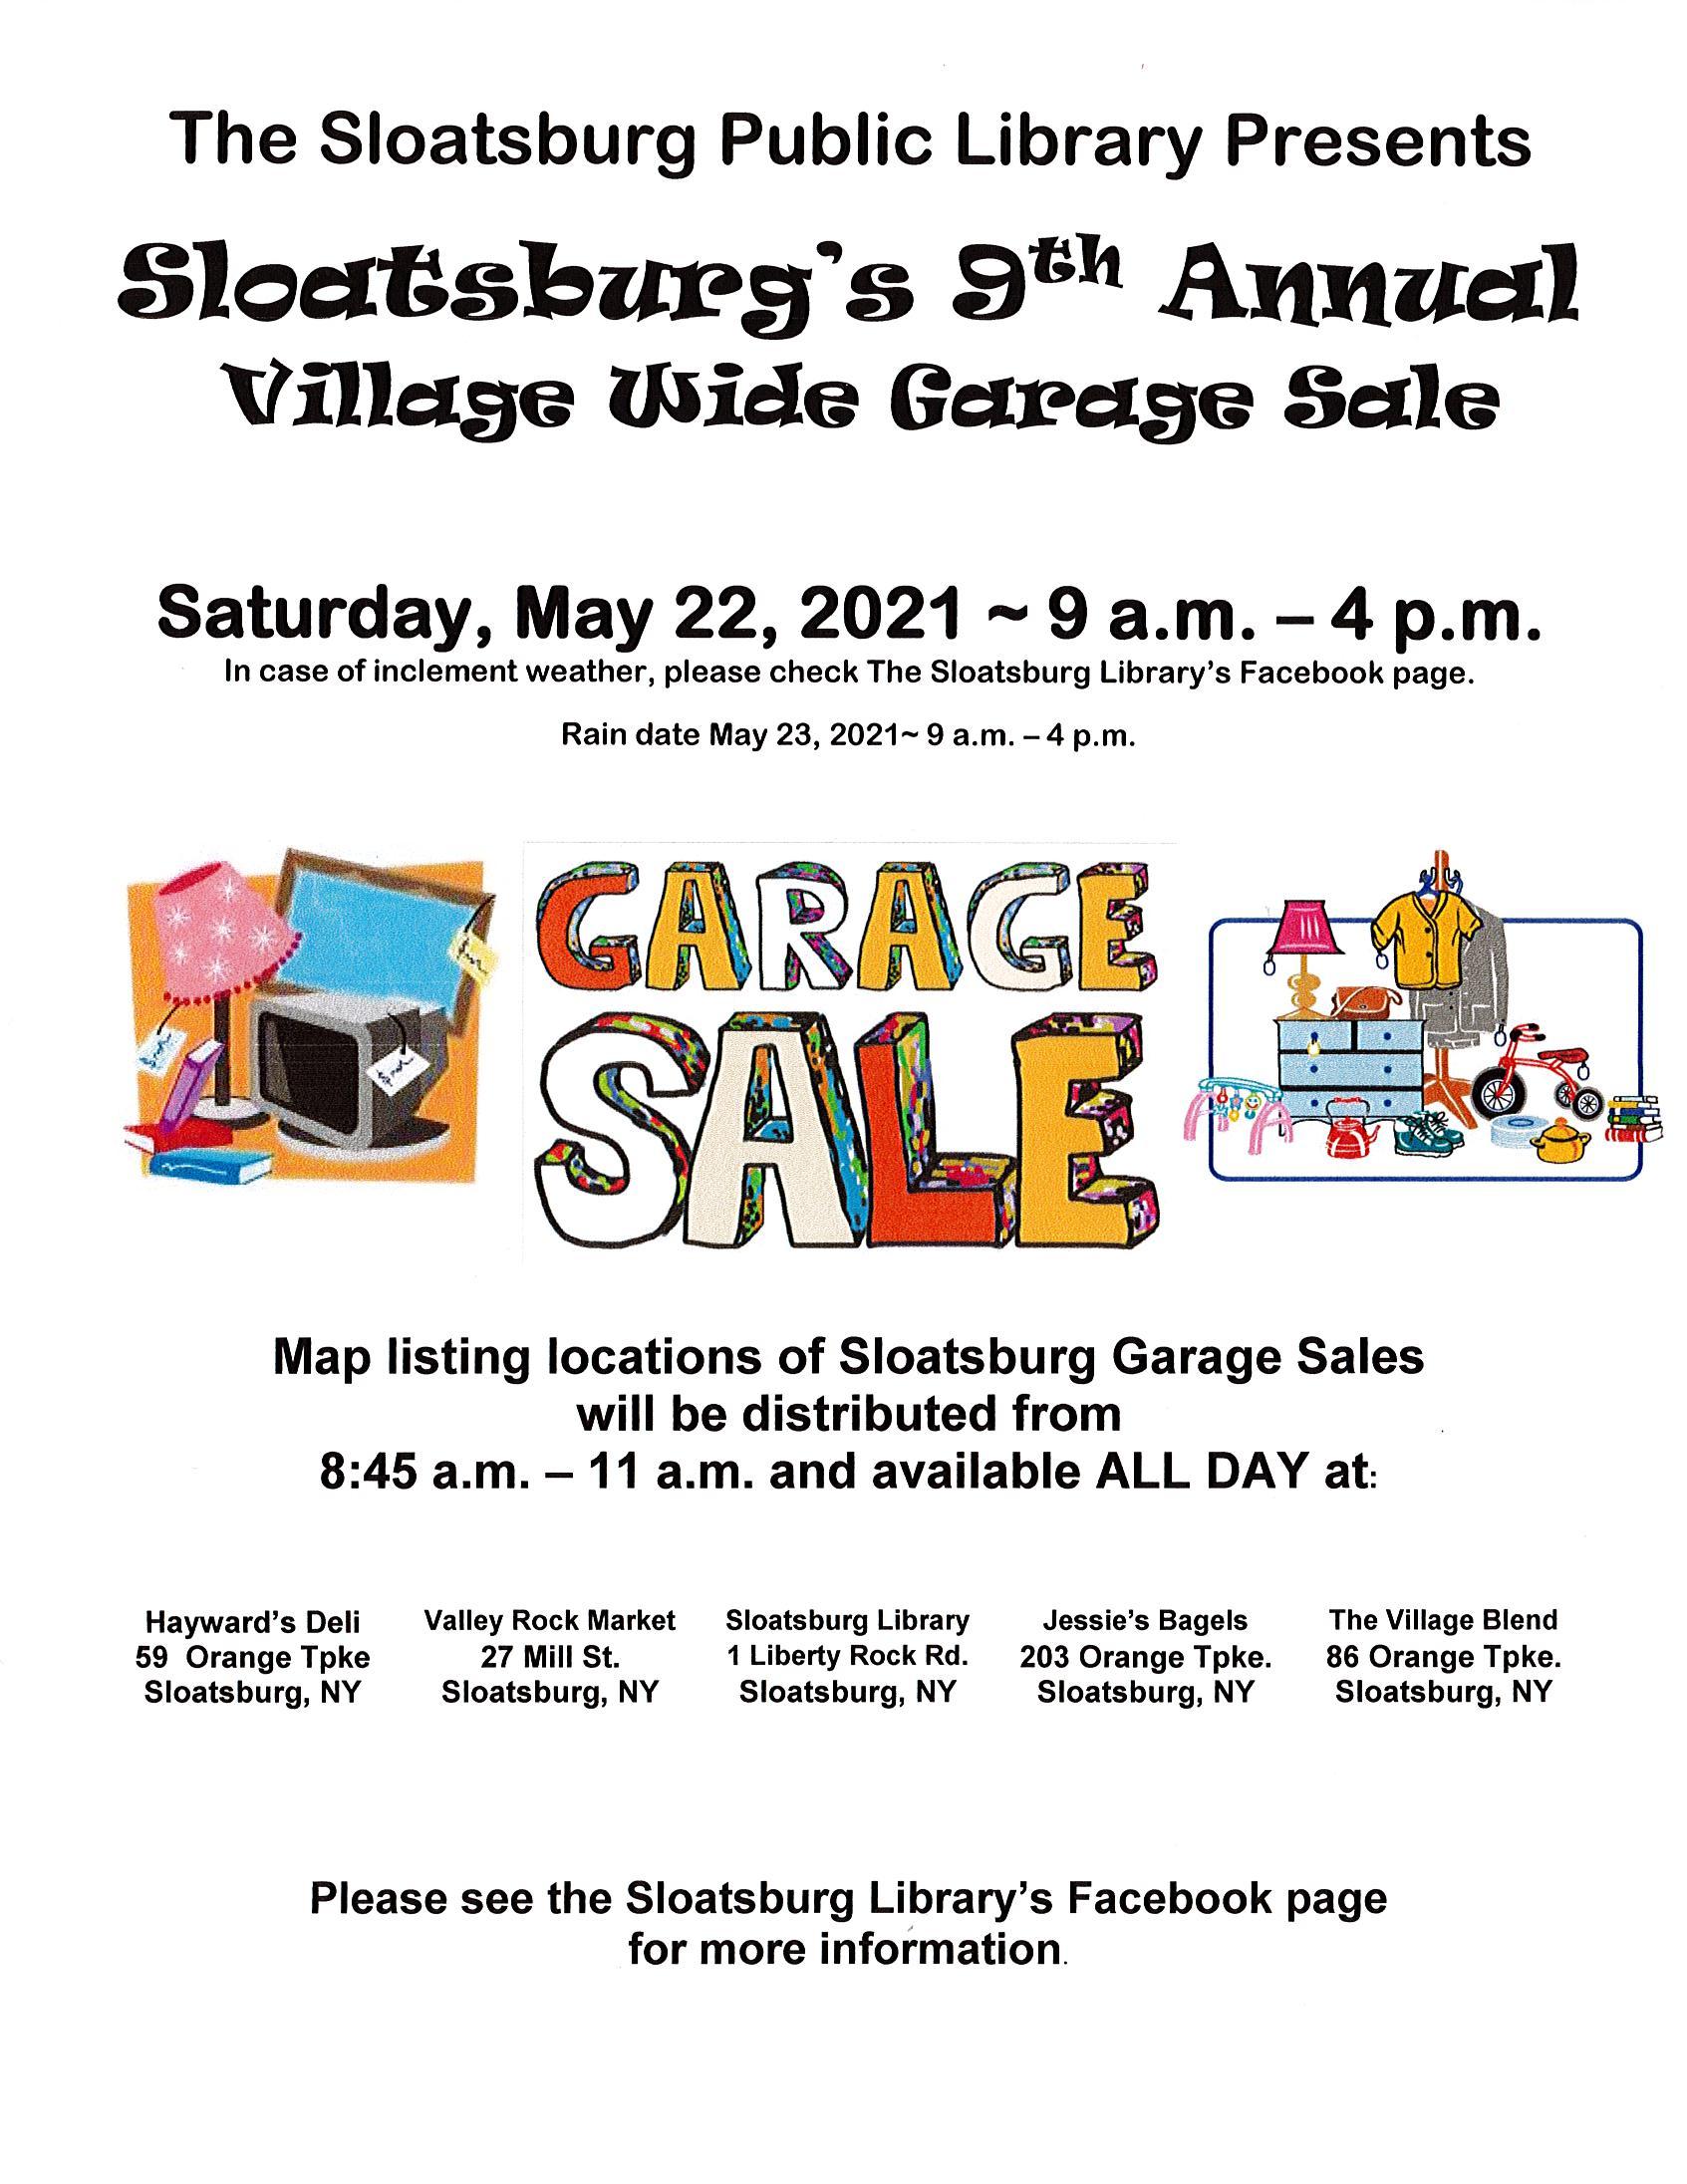 SLOATSBURG'S 9th ANNUAL VILLAGE WIDE GARAGE SALE at Sloatsburg Public Library